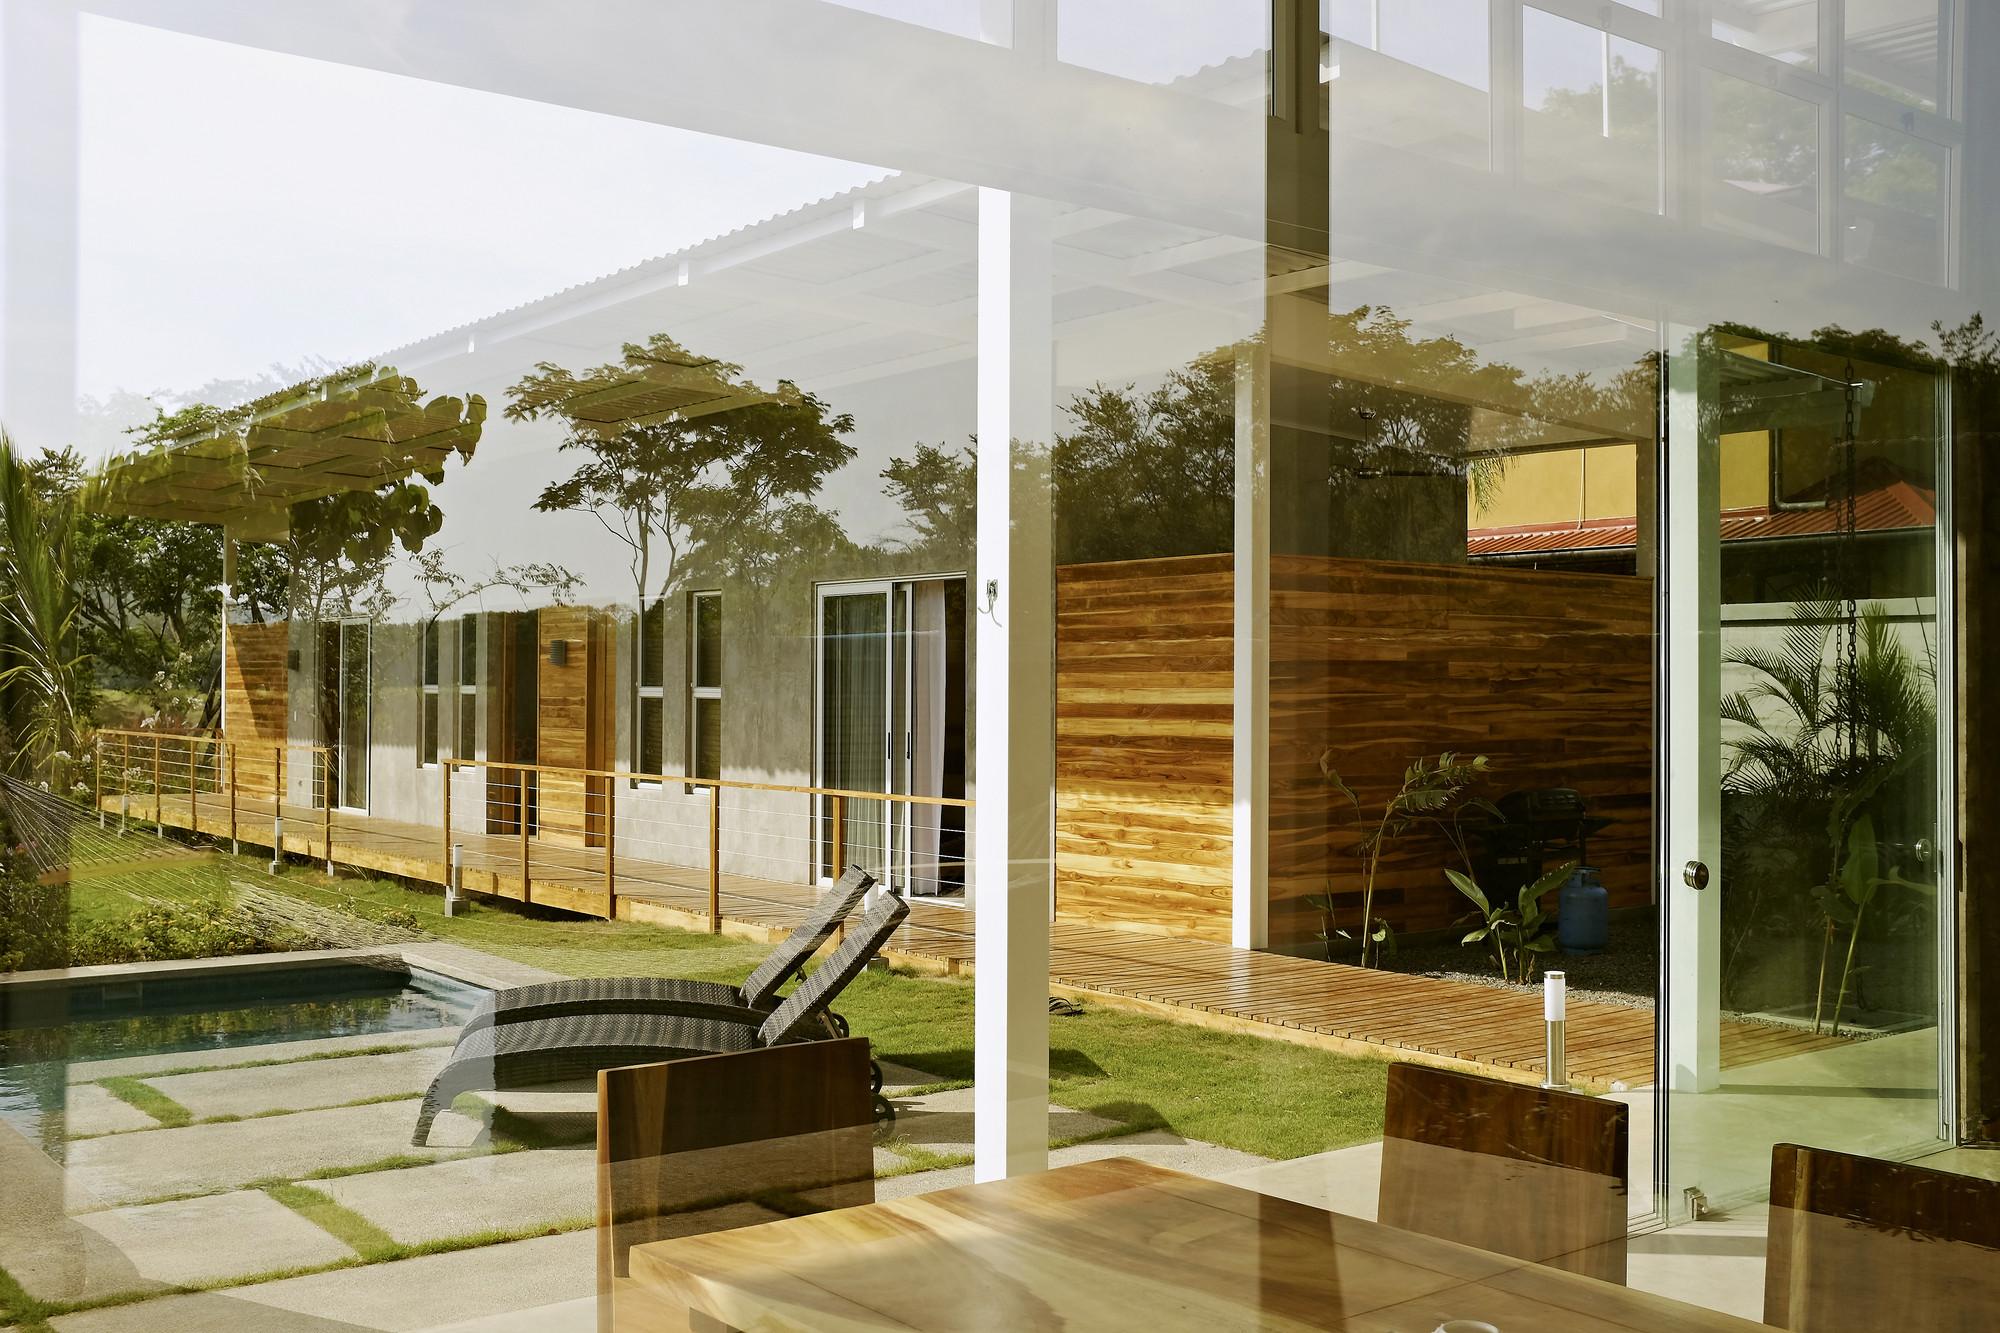 Galer a de casa jard n del mar salagnac arquitectos 2 for Casas jardin del mar